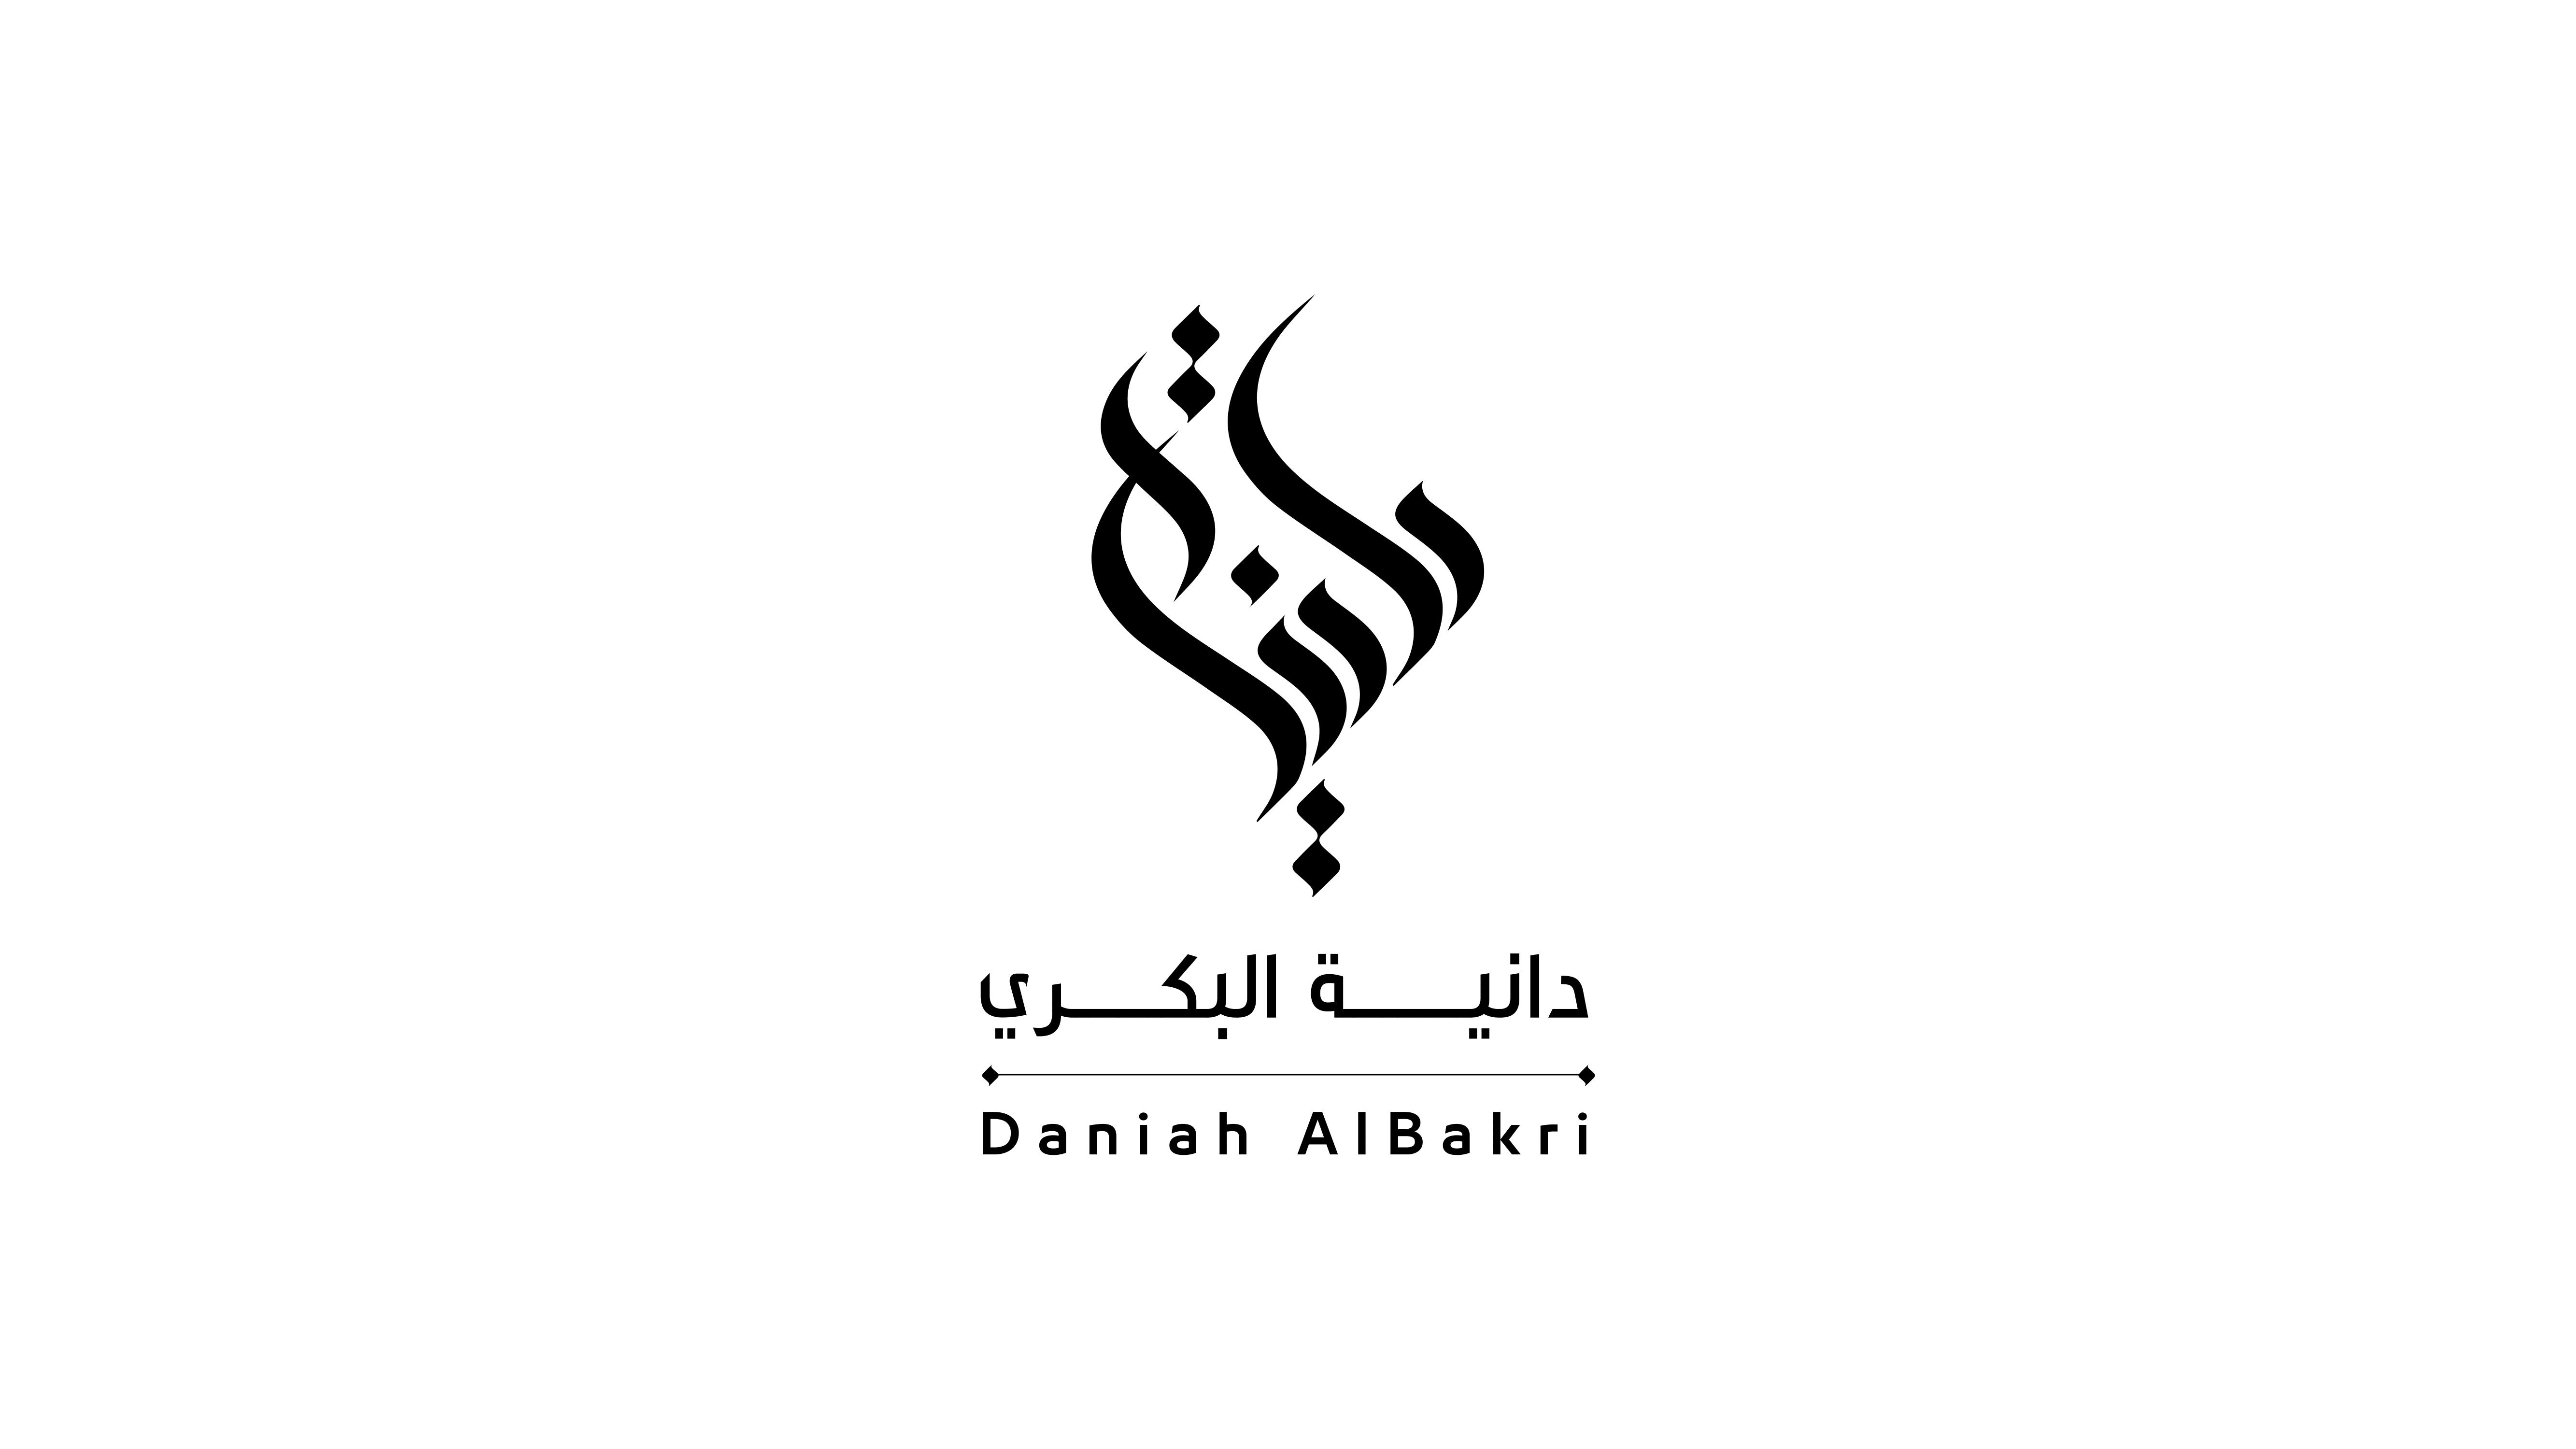 Daniah Albakri